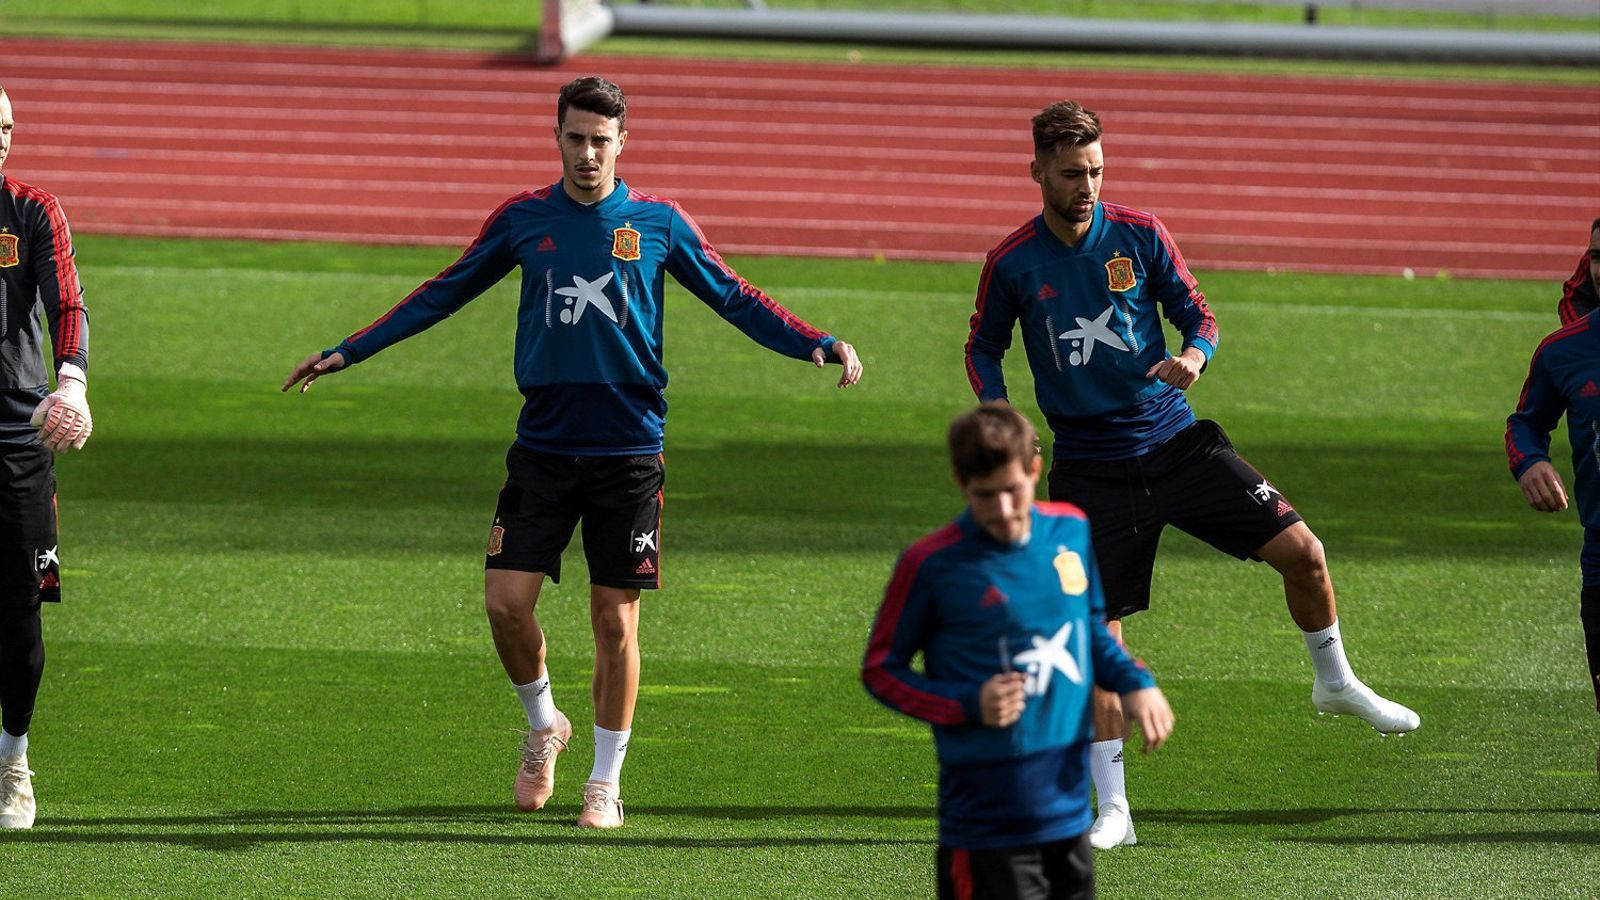 El central de l'Espanyol i exjugador del planter del Reial Madrid Mario Hermoso exercitant-se amb la selecció espanyola.